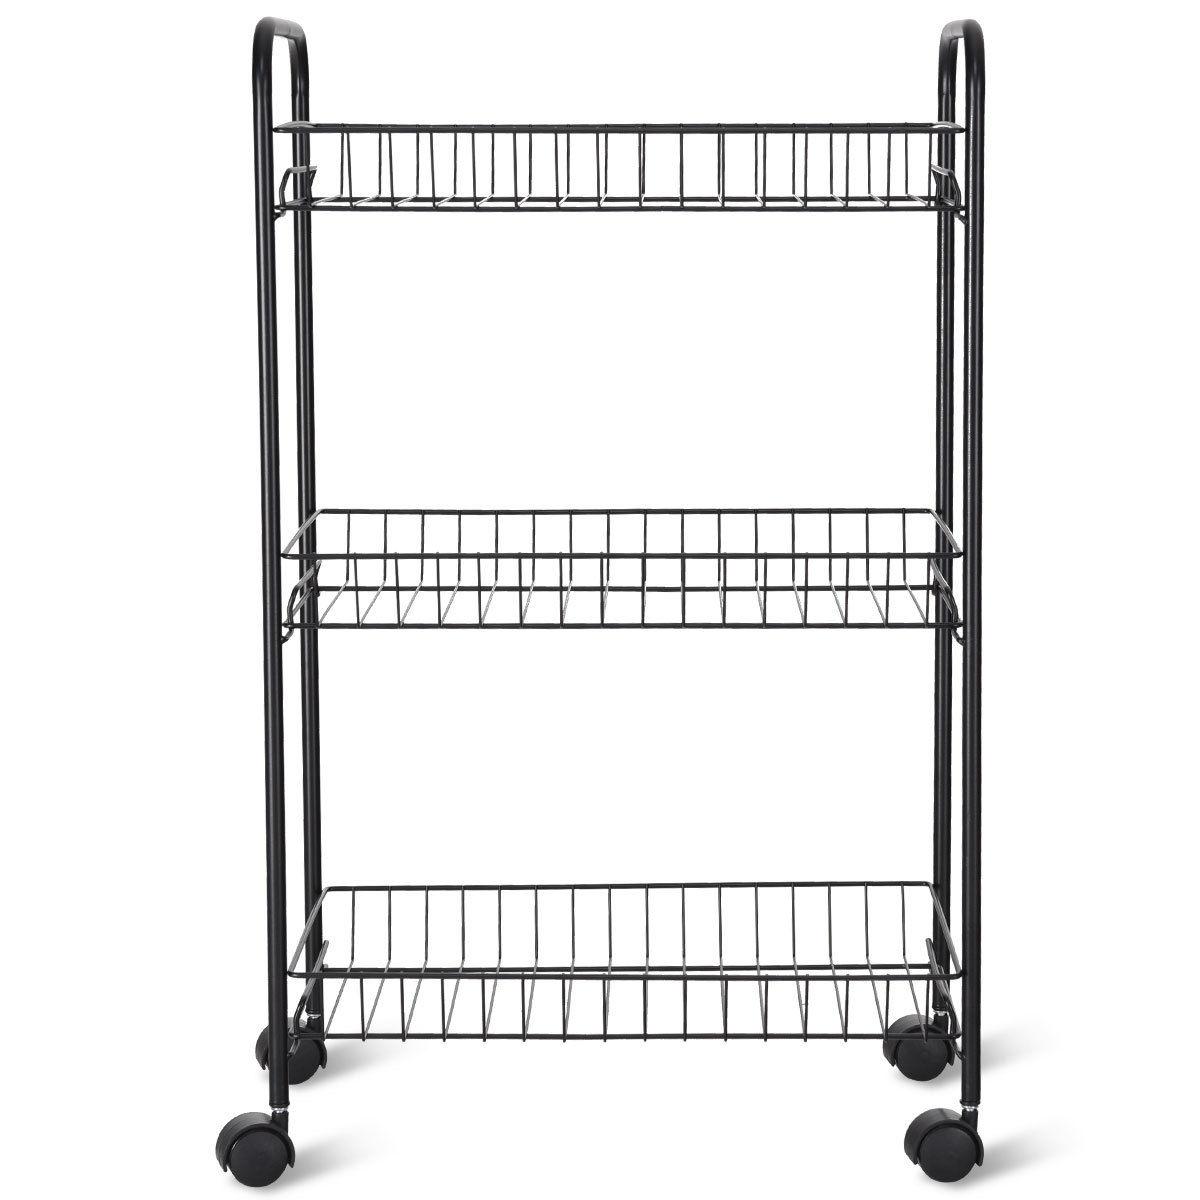 3 Tier Rolling Kitchen Trolley Utility Cart Metal Wire